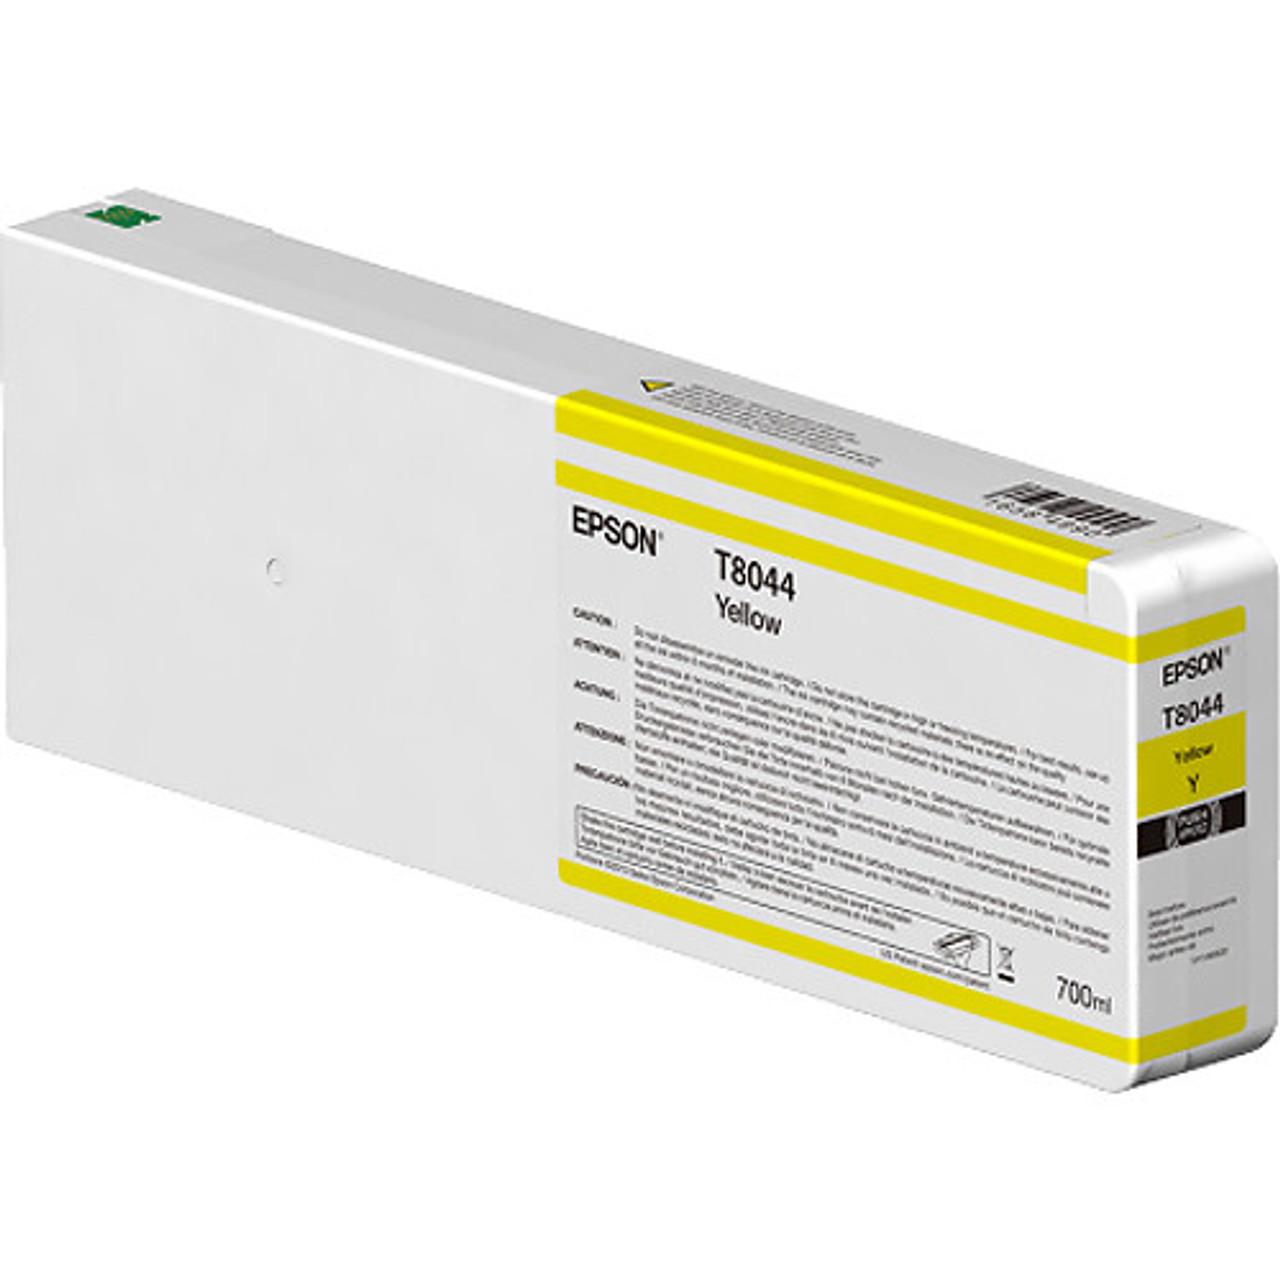 Epson T804400 UltraChrome HD Yellow Ink Cartridge (700ml)